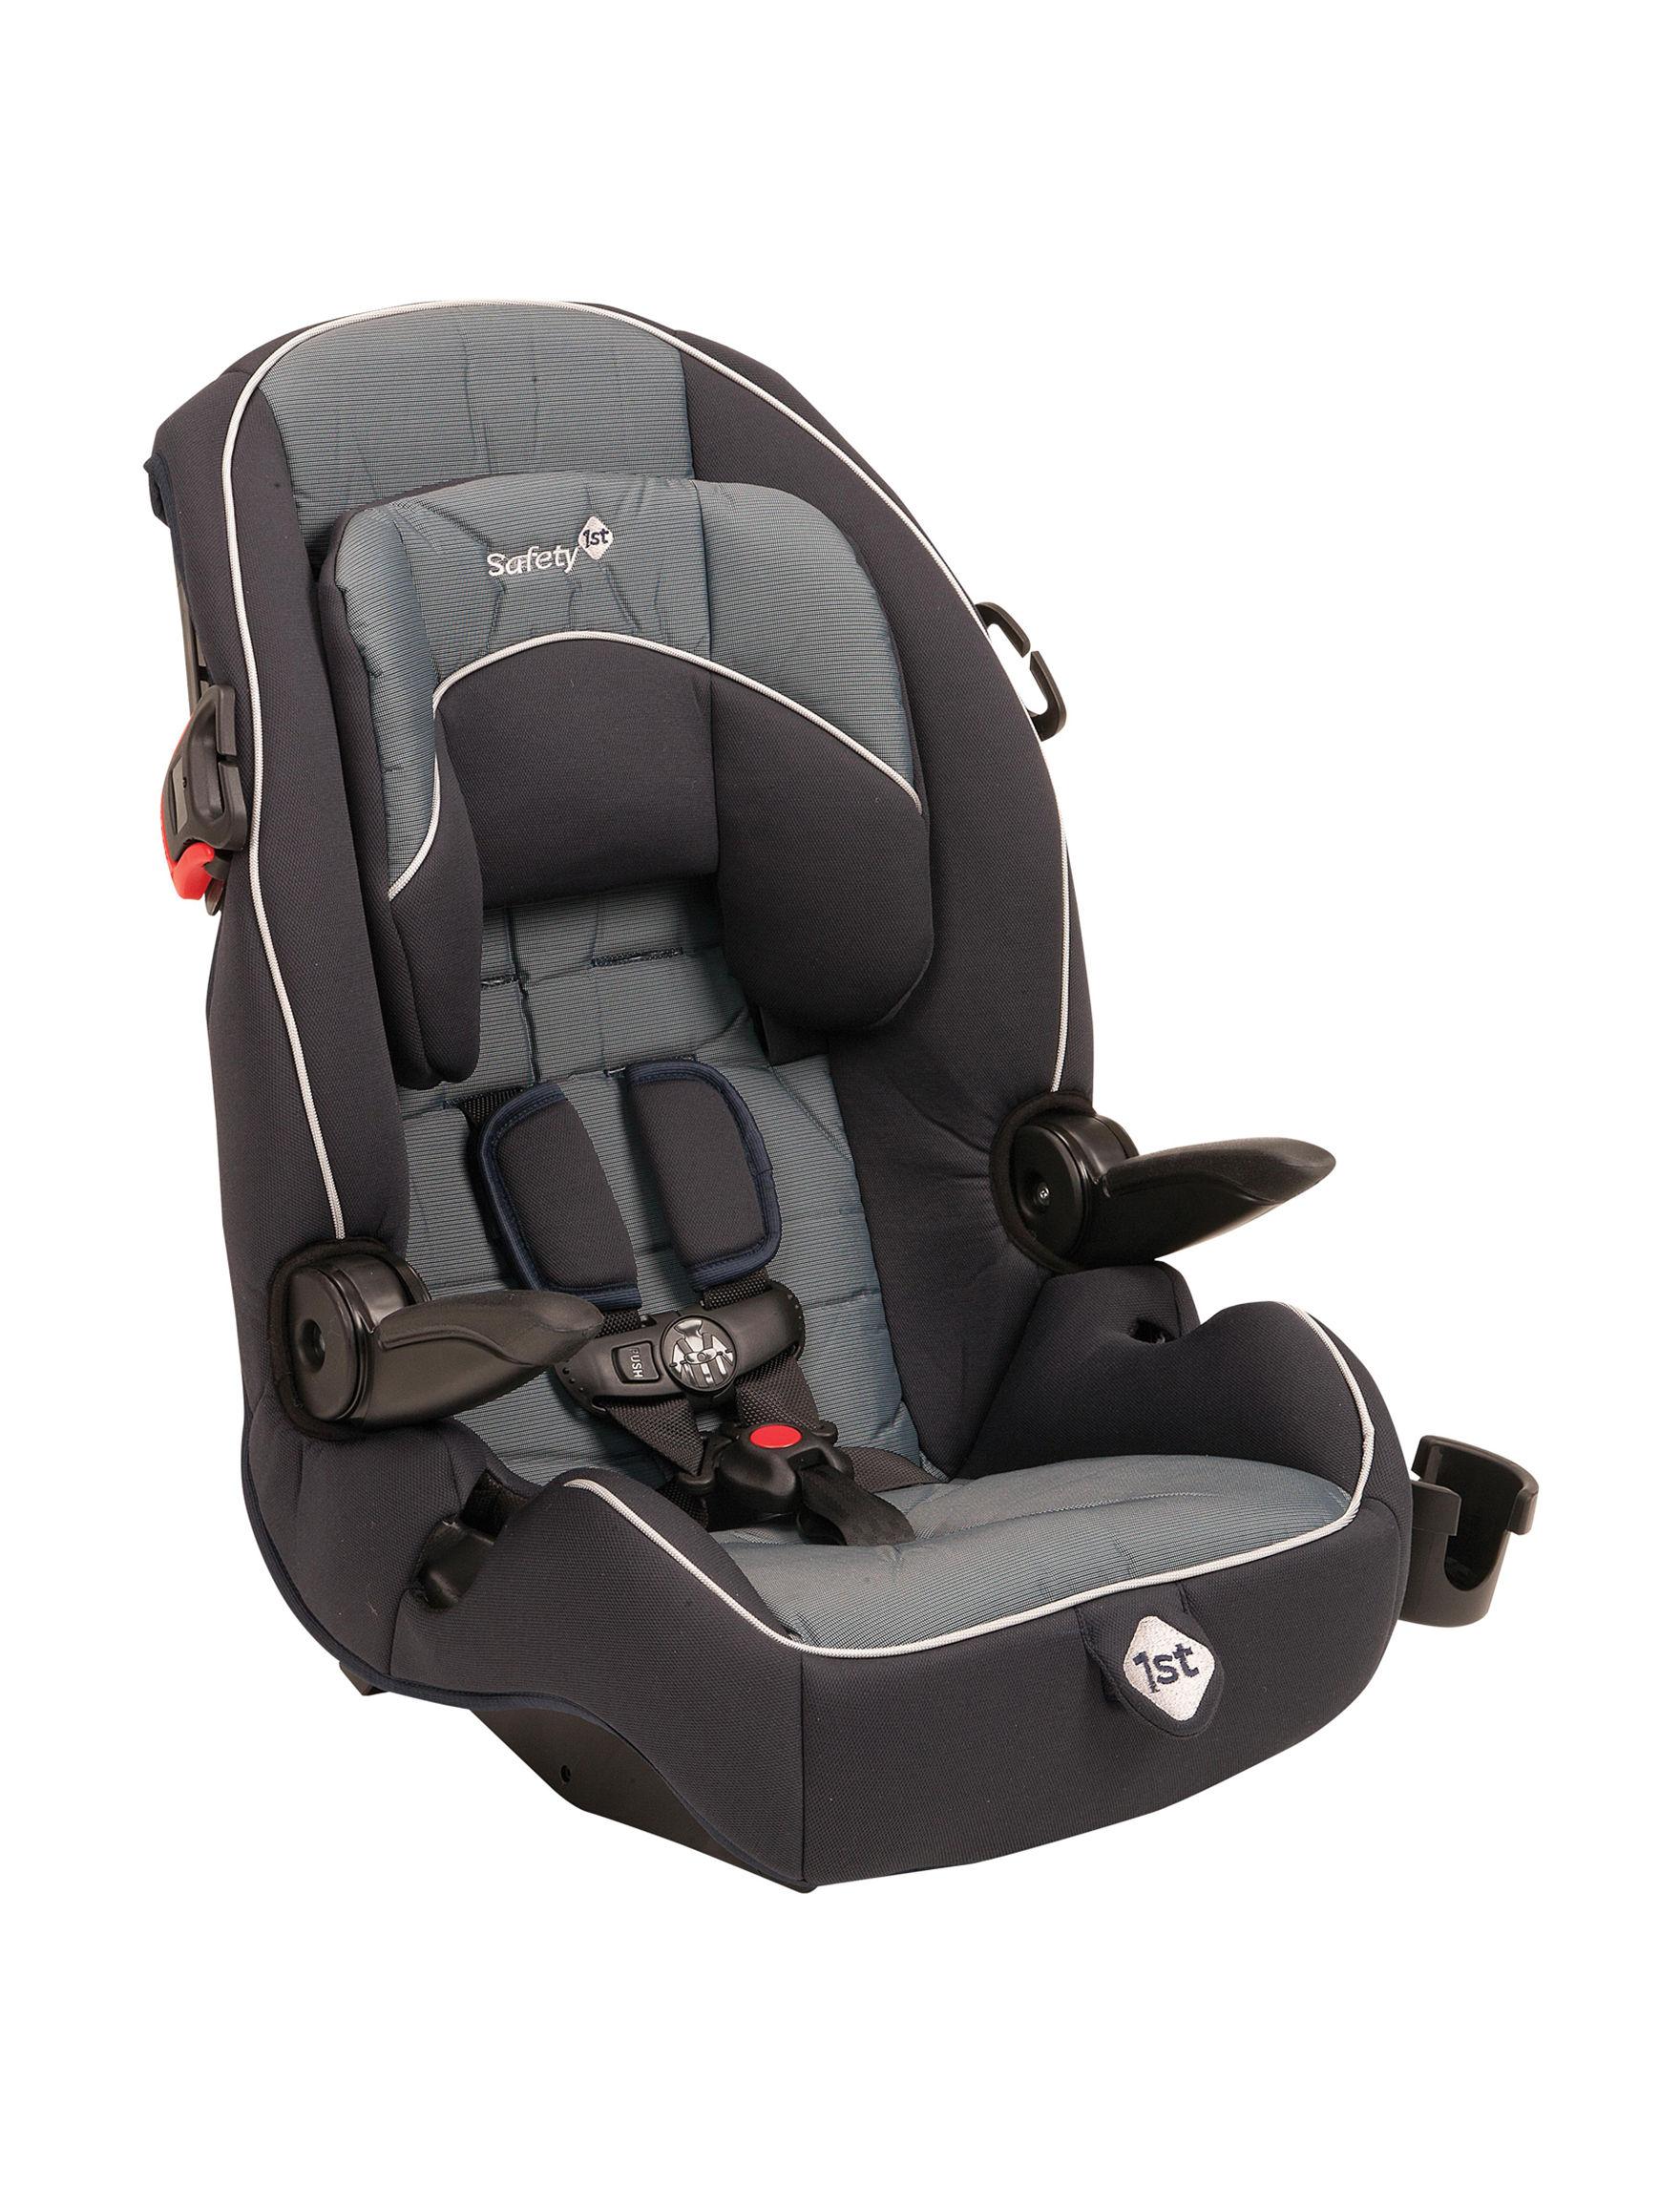 Safety 1st Summit 65 Car Seat